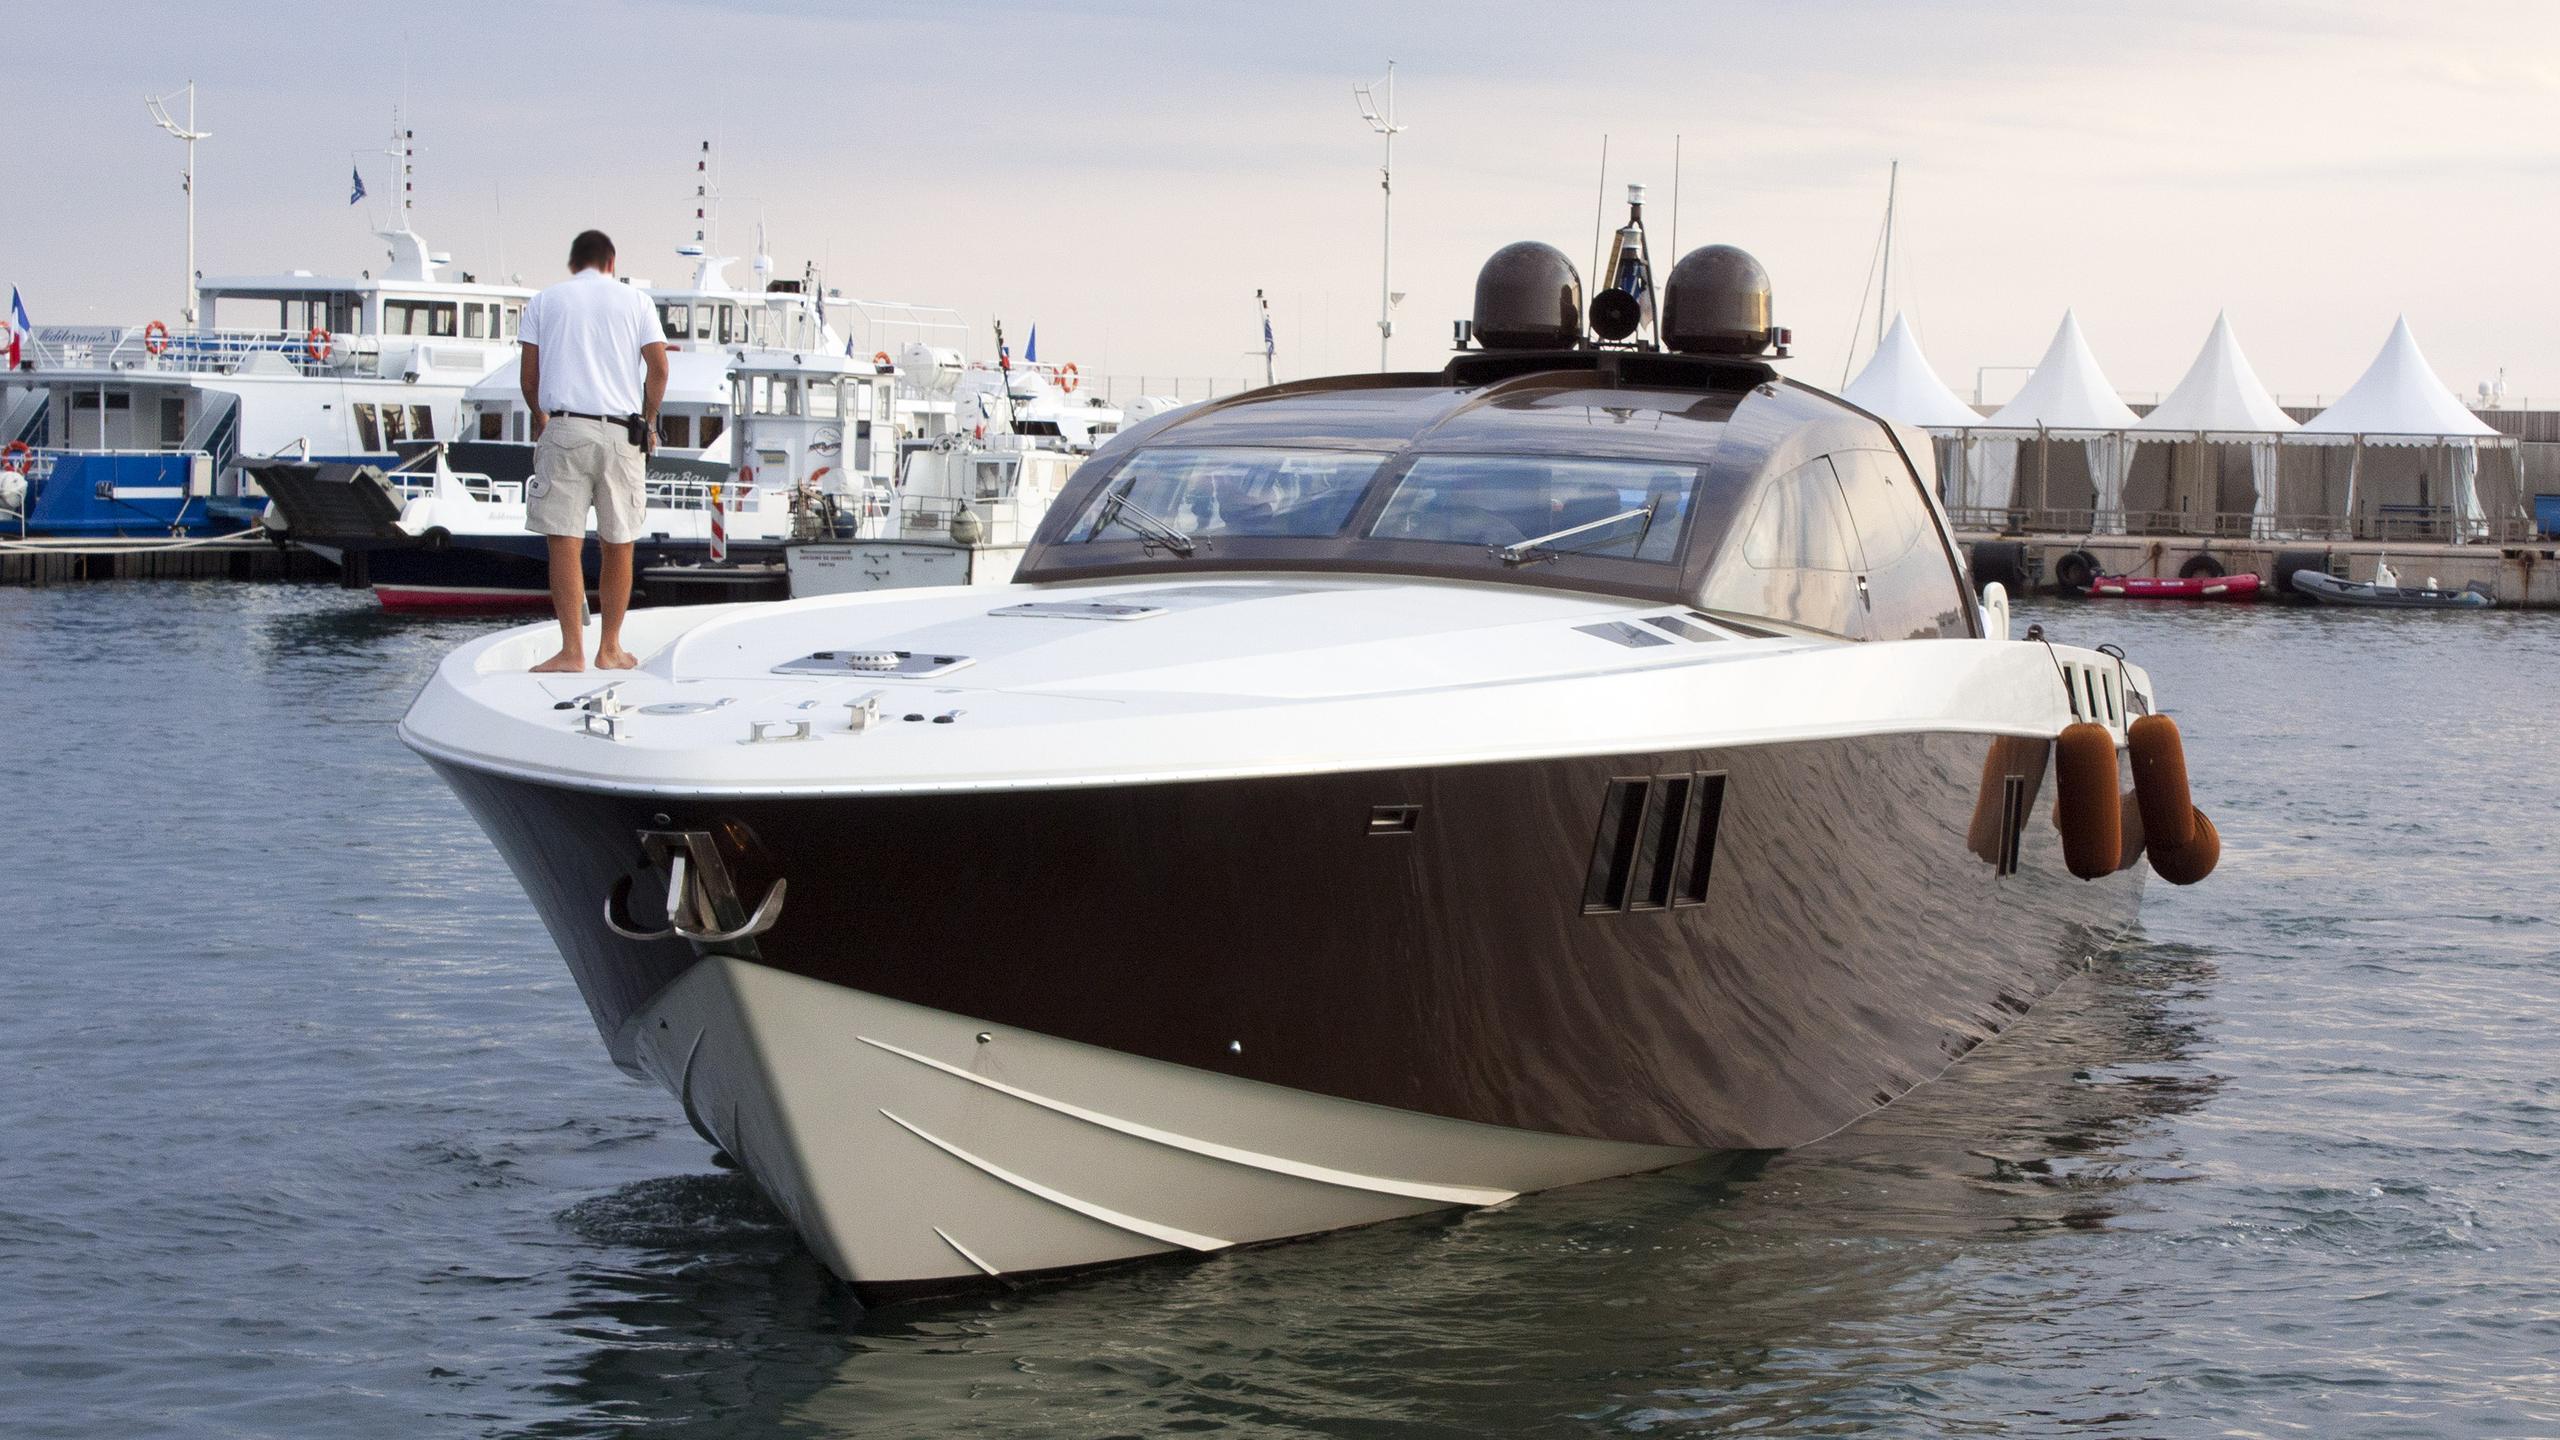 mr brown motoryacht otam 80 ht 04 2012 25m bow